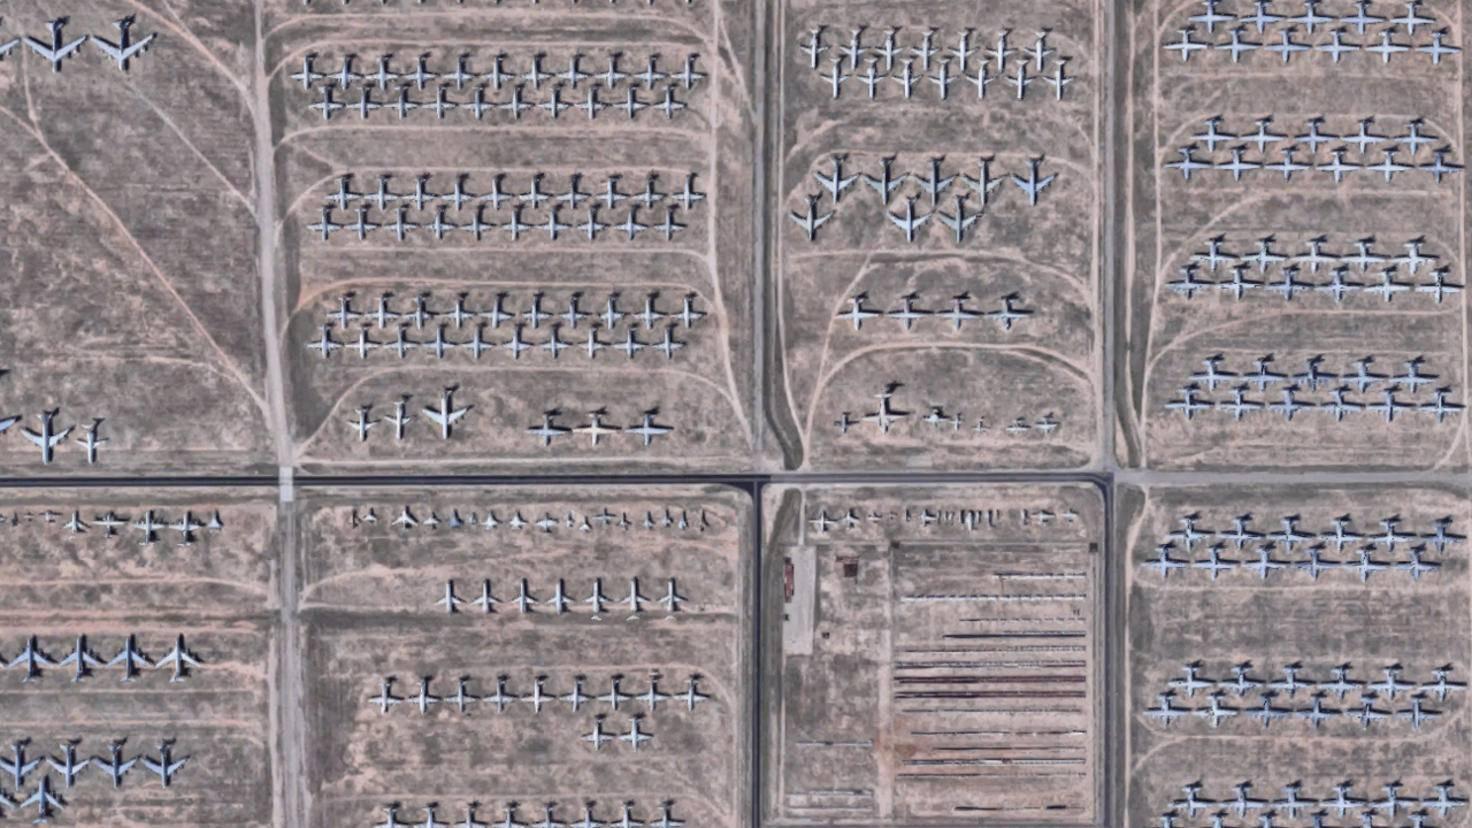 Google-Earth-Flugzeug-Friedhof